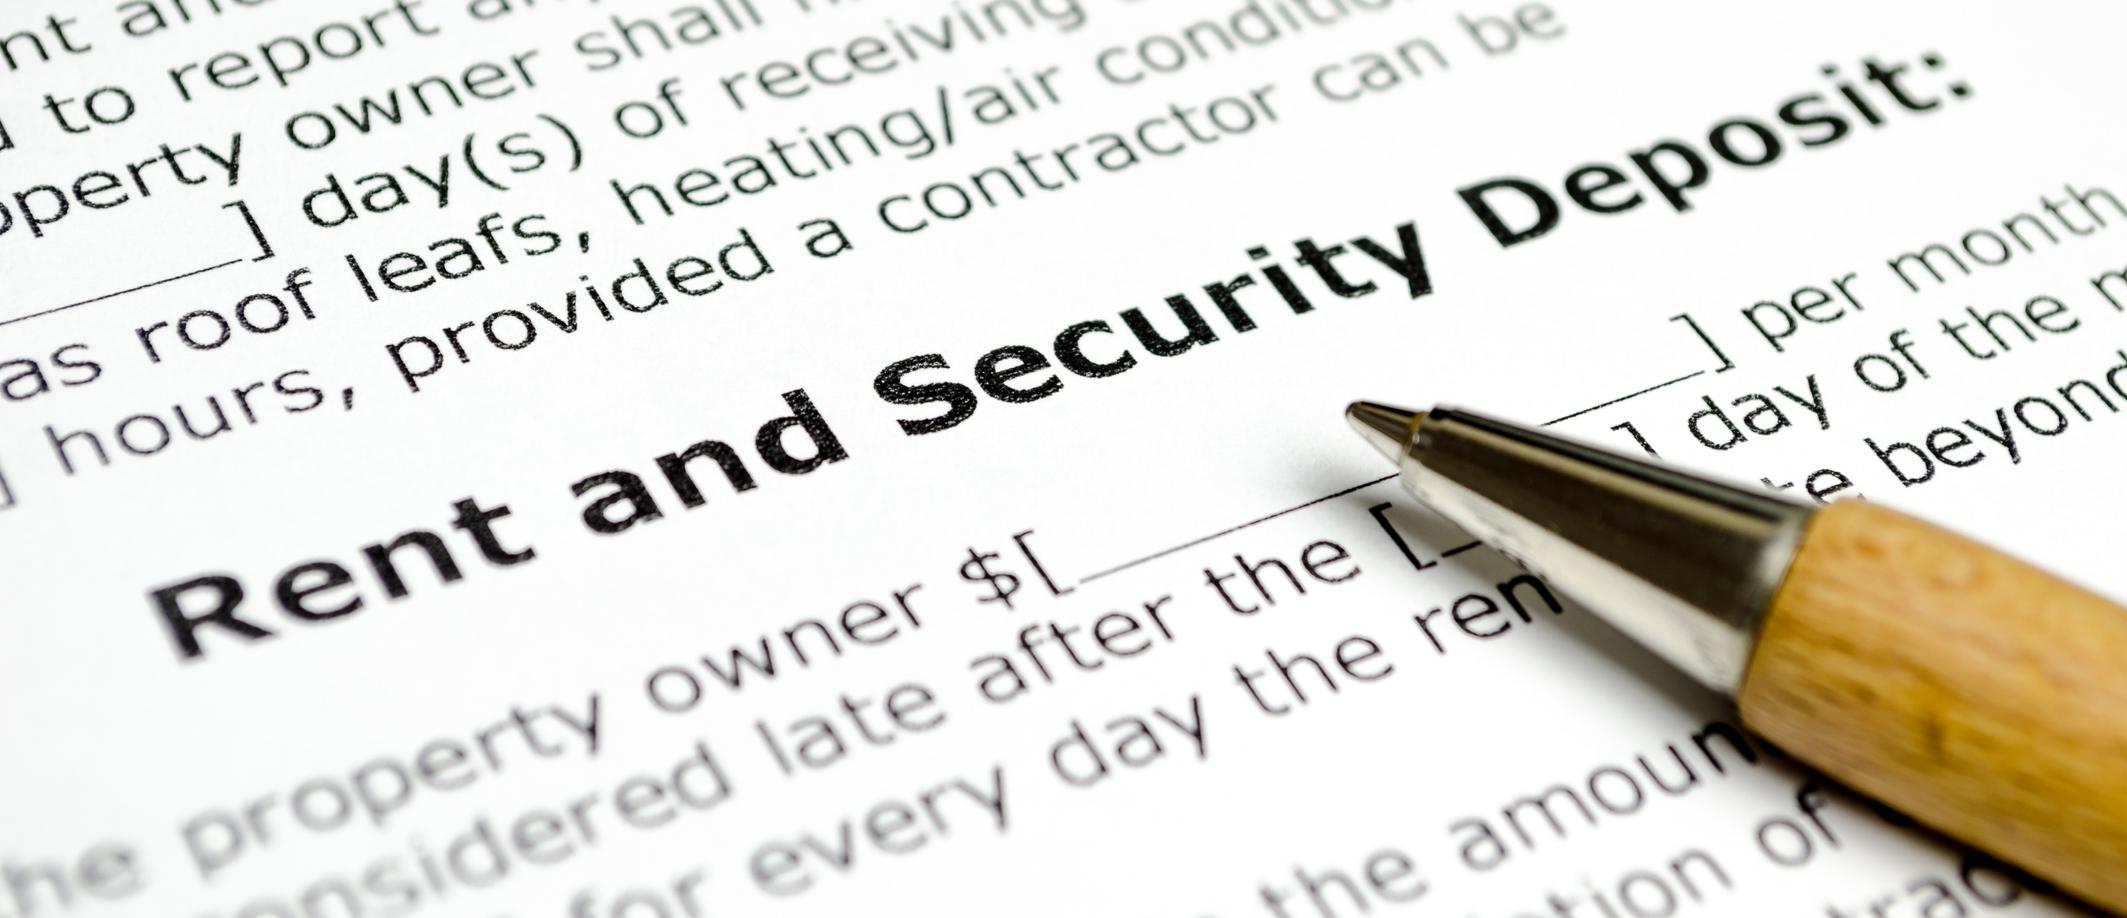 Florida Security Deposit Demand Letter from www.findlawimages.com